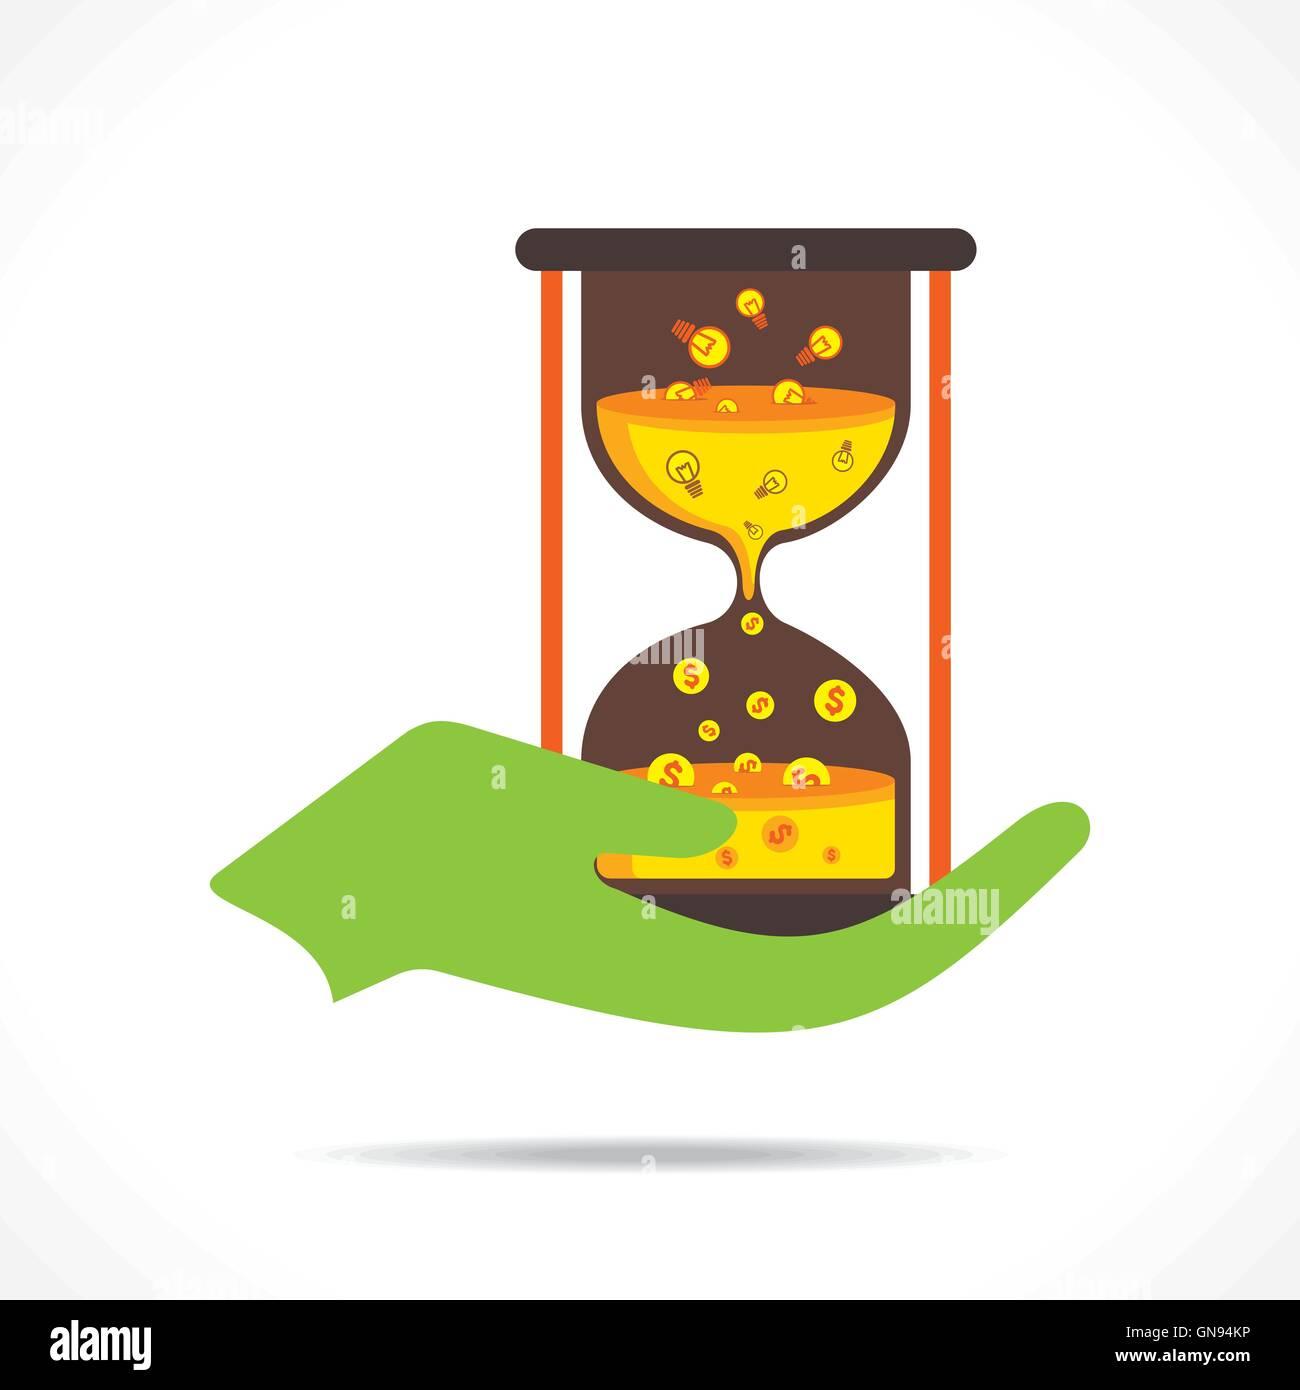 creative concept idea convert into money with respect of